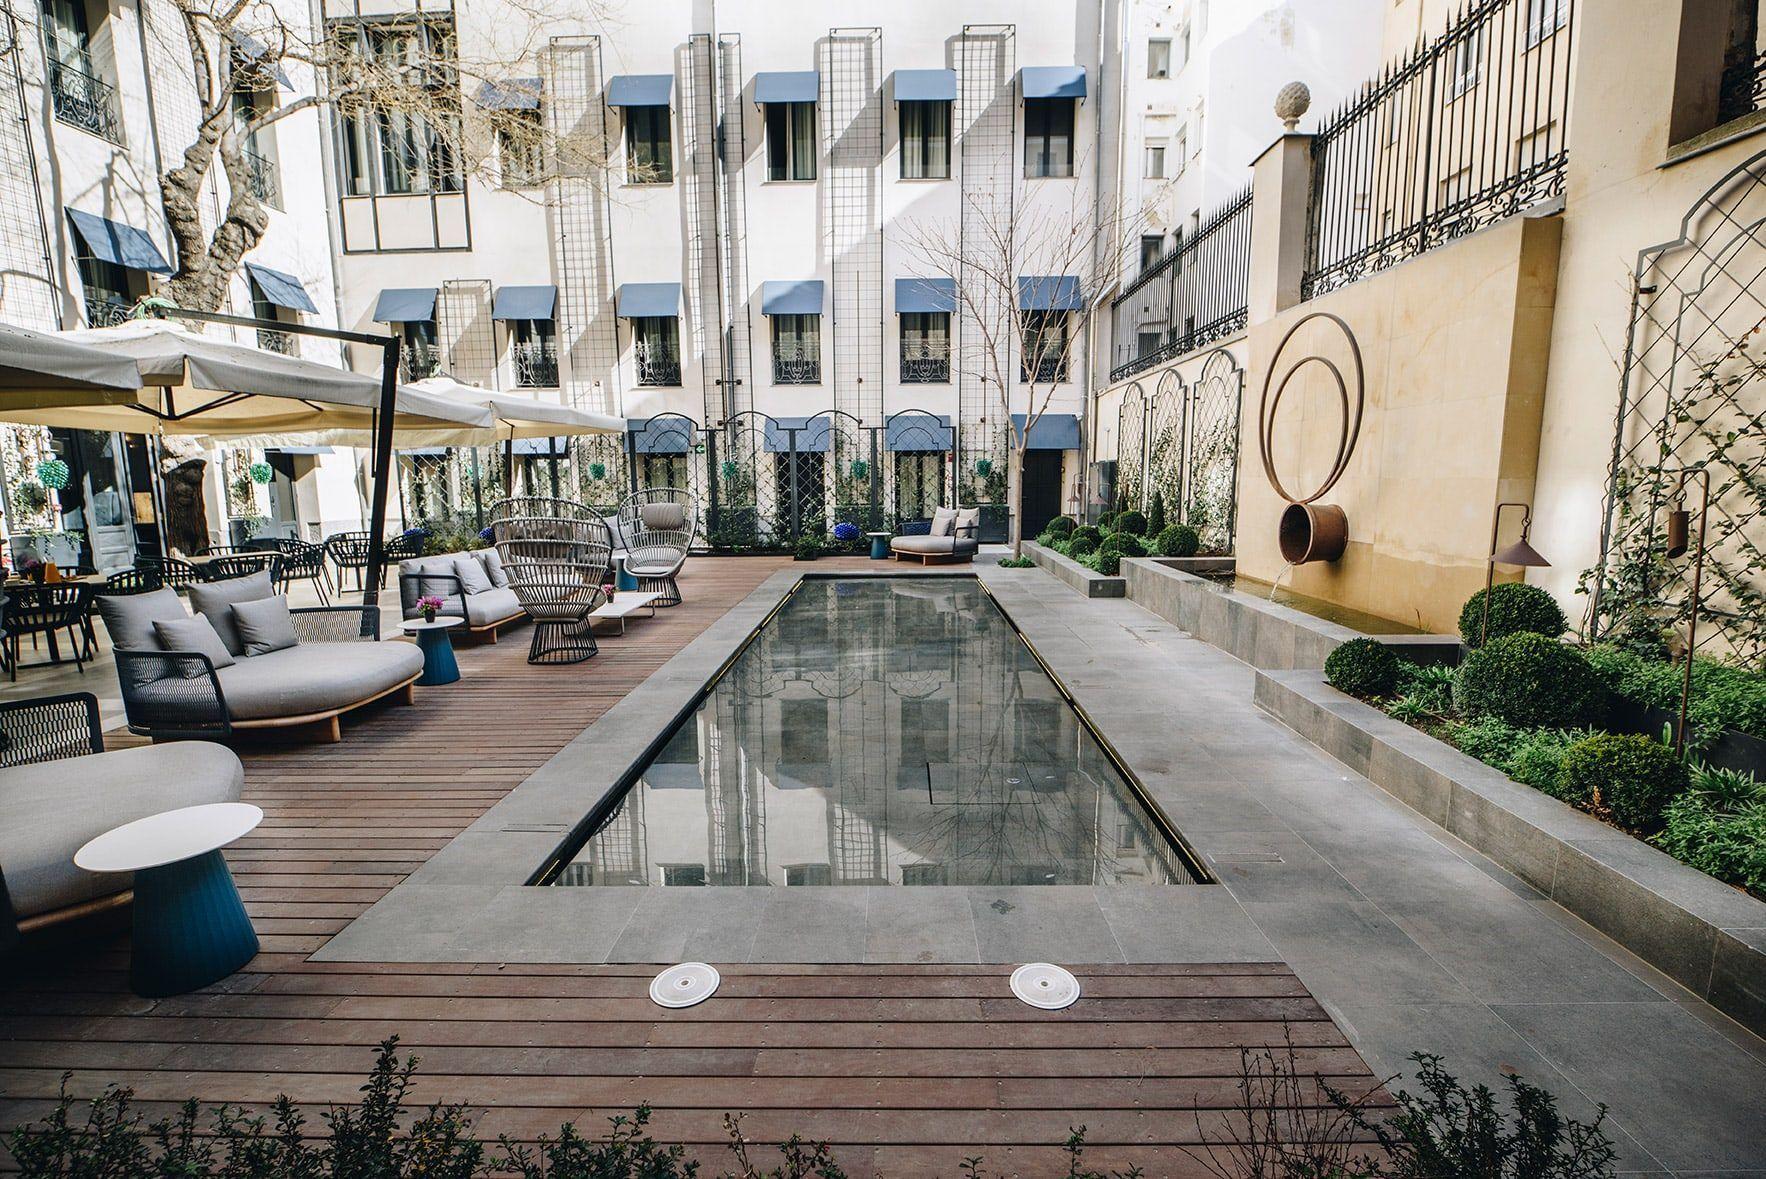 CoolRooms_Atocha-hotel-atocha-poolgarden